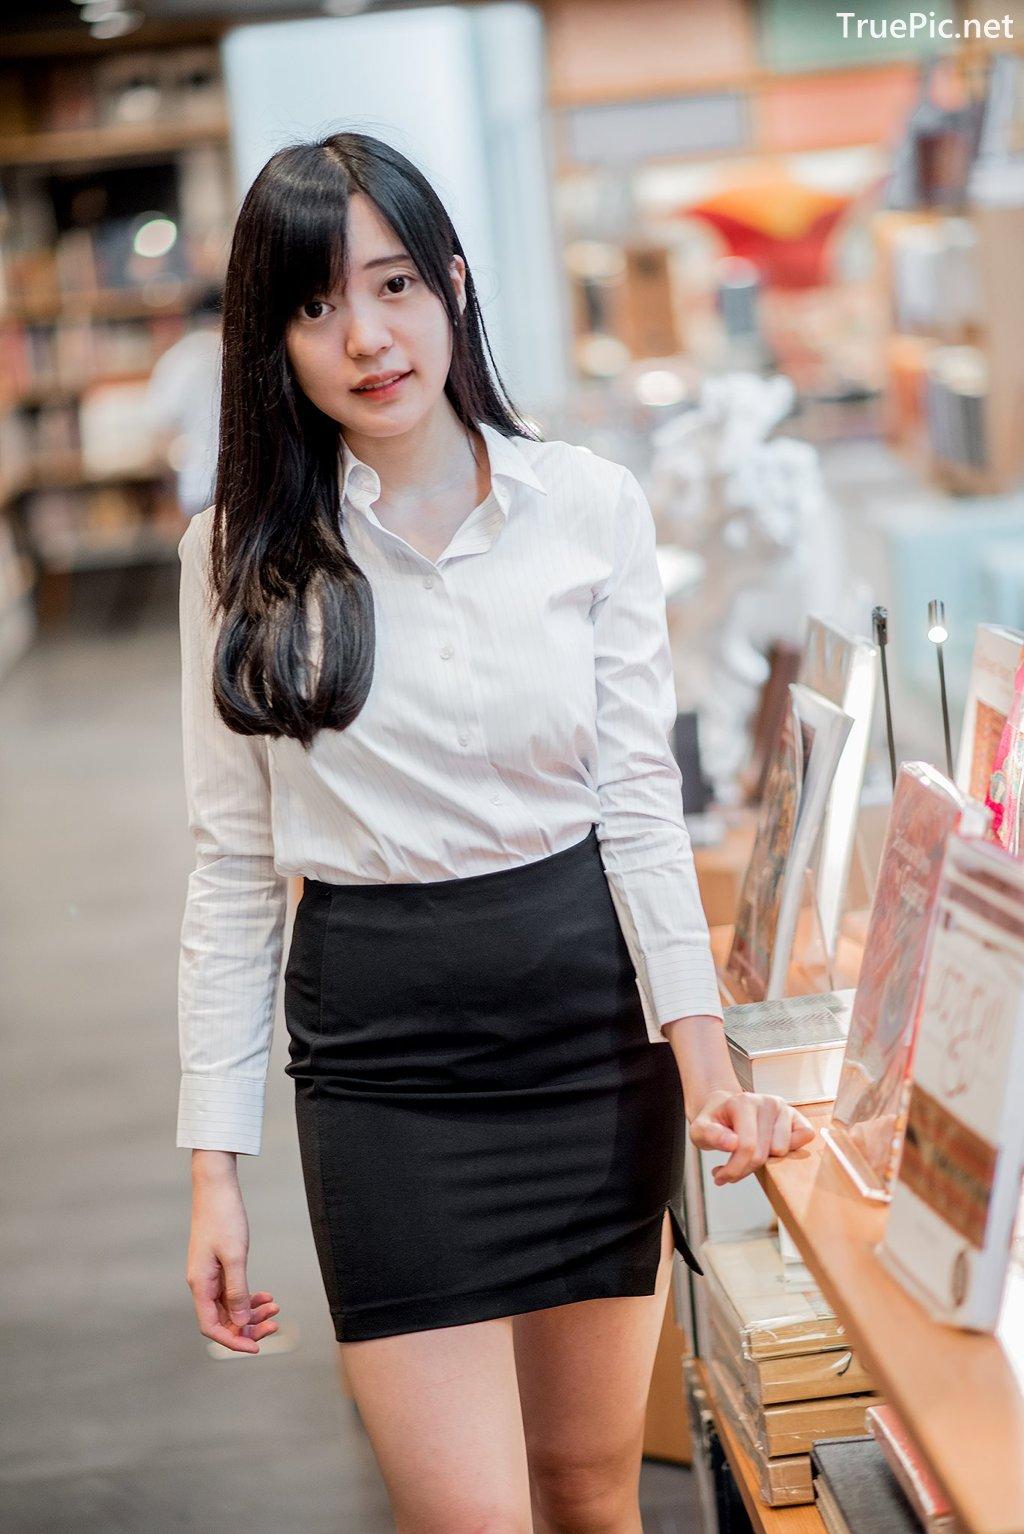 Image Thailand Model - Sarunrat Baifern Ong - Concept Kim's Secretary - TruePic.net - Picture-5